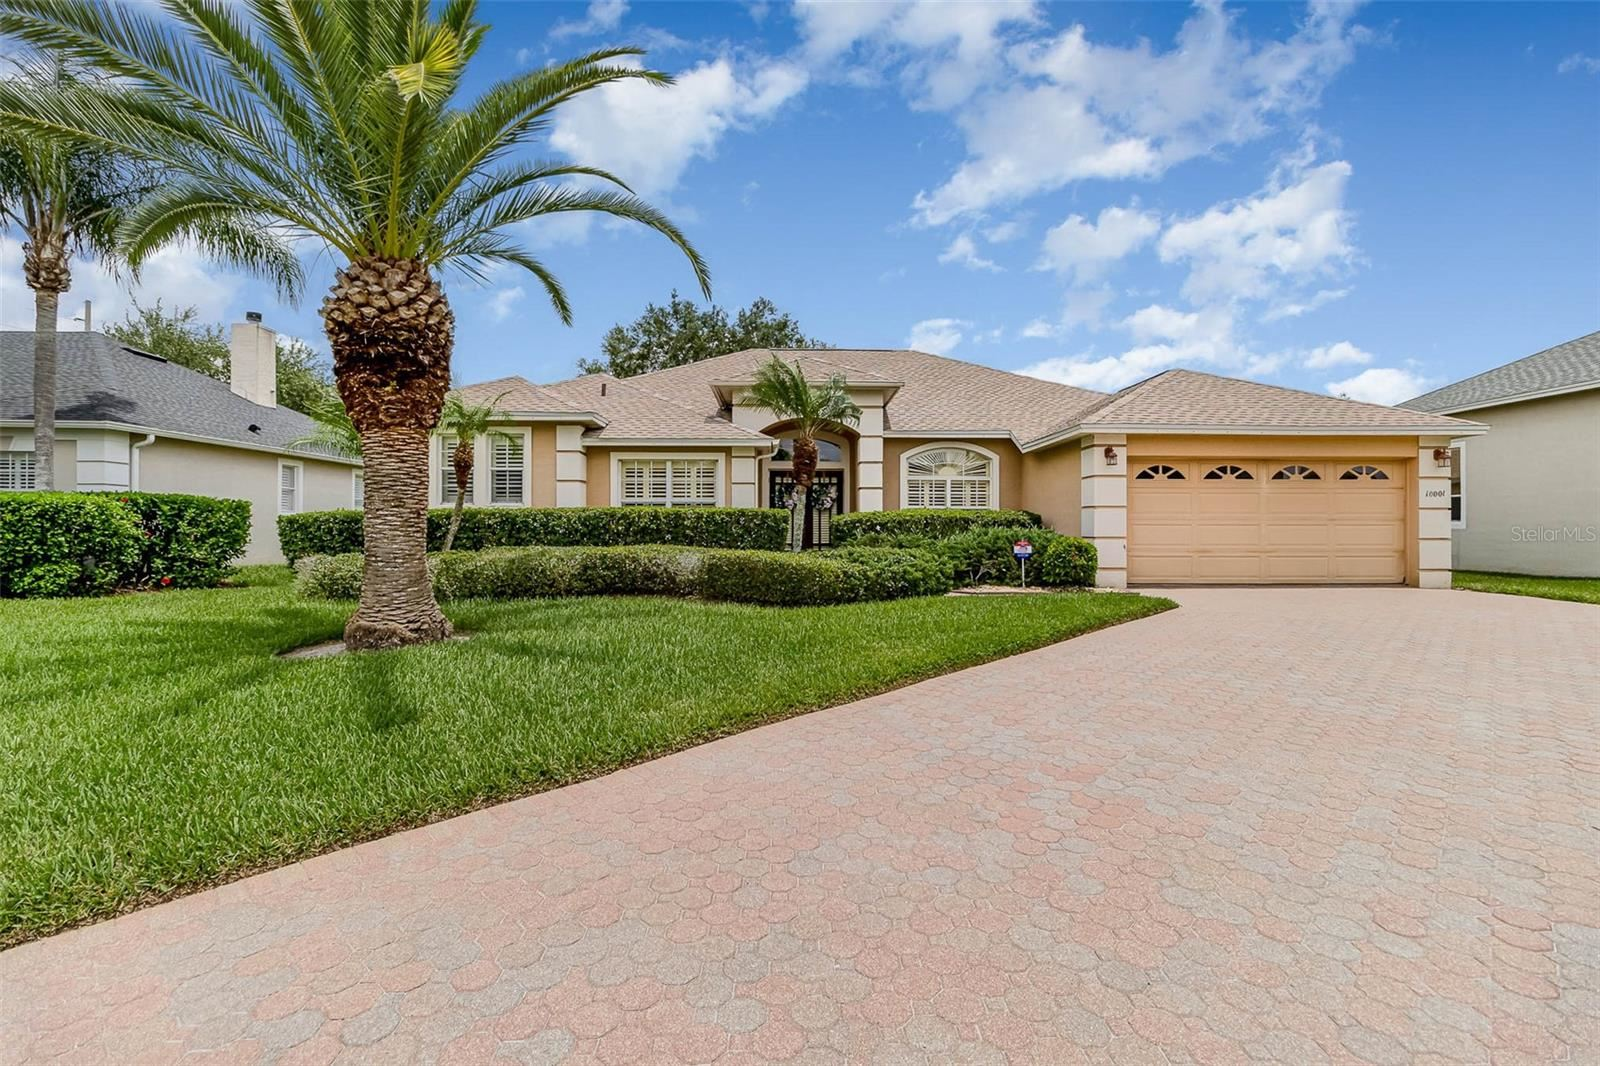 10001 HIGHLAND WOODS COURT, Orlando, FL 32836 - #: O5953263